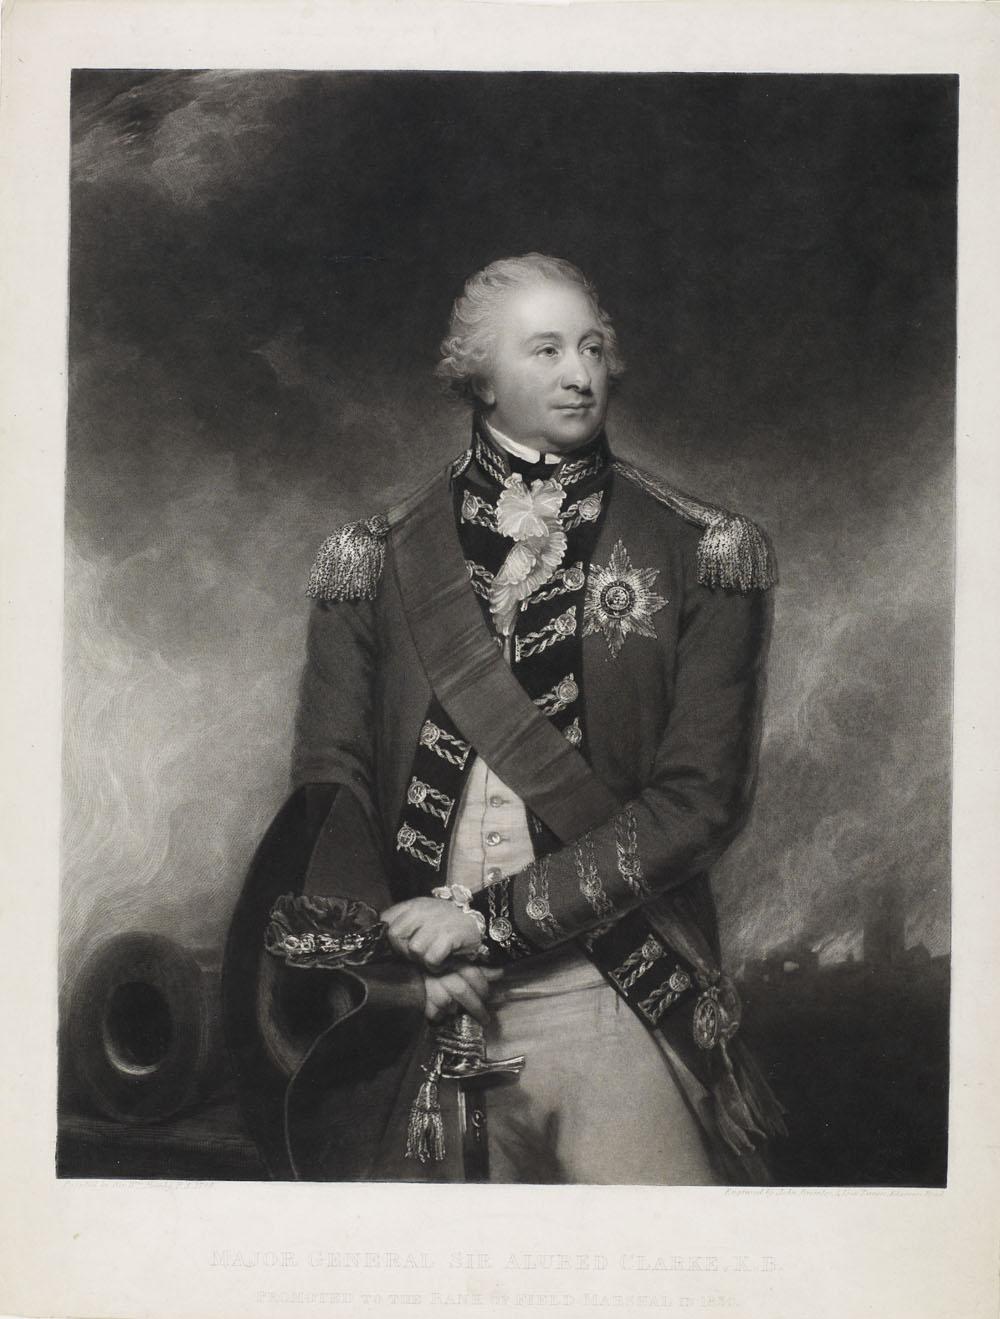 Sir Alured Clarke